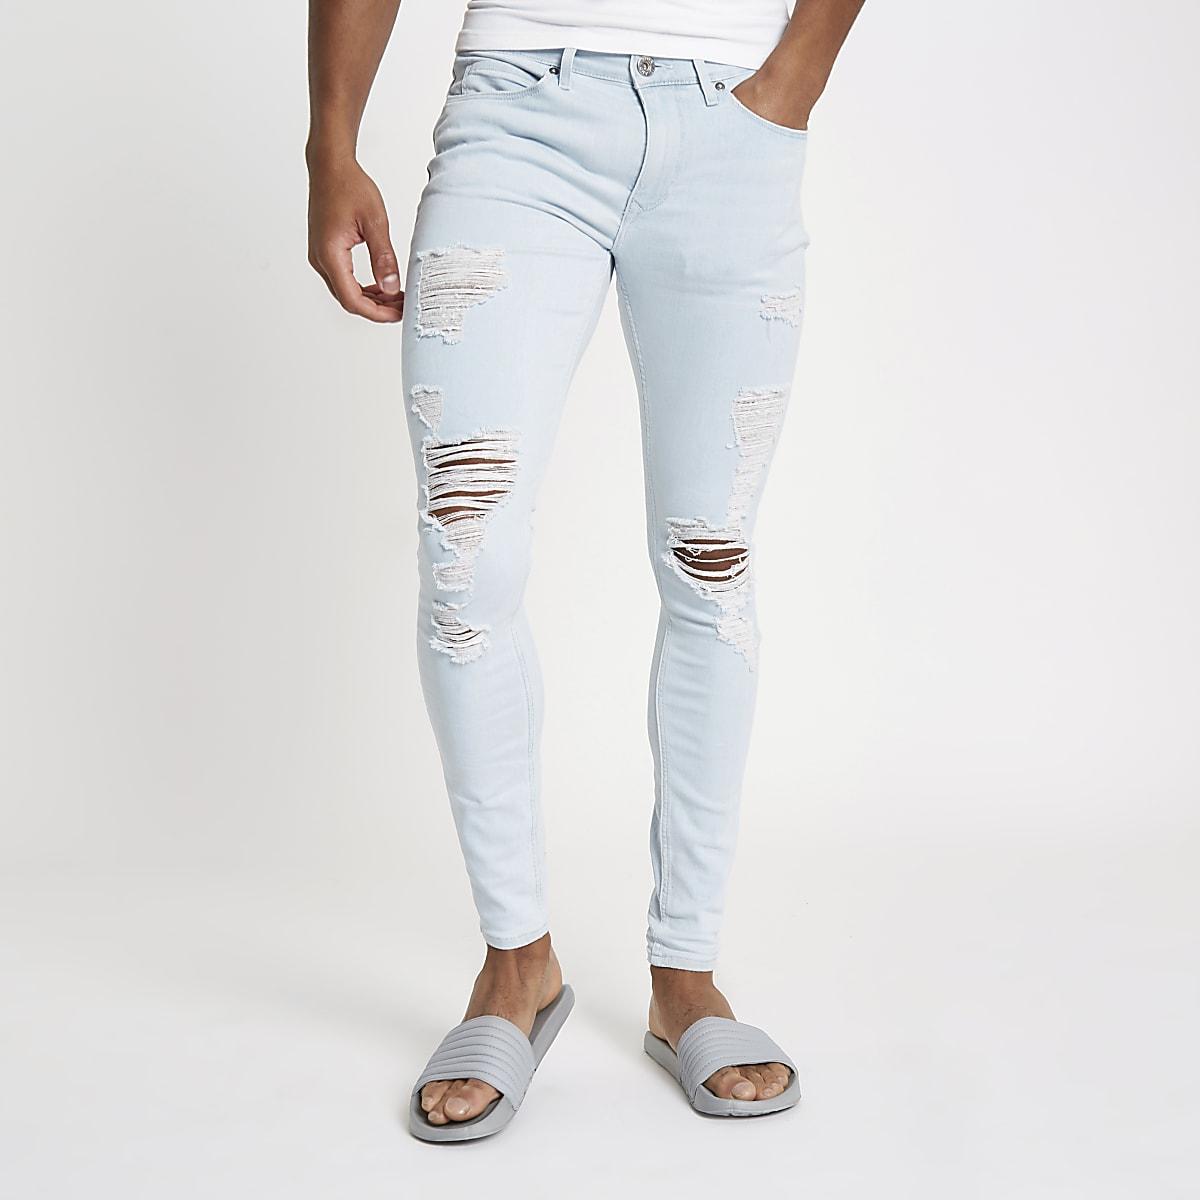 Light blue Ollie ripped spray on skinny jeans